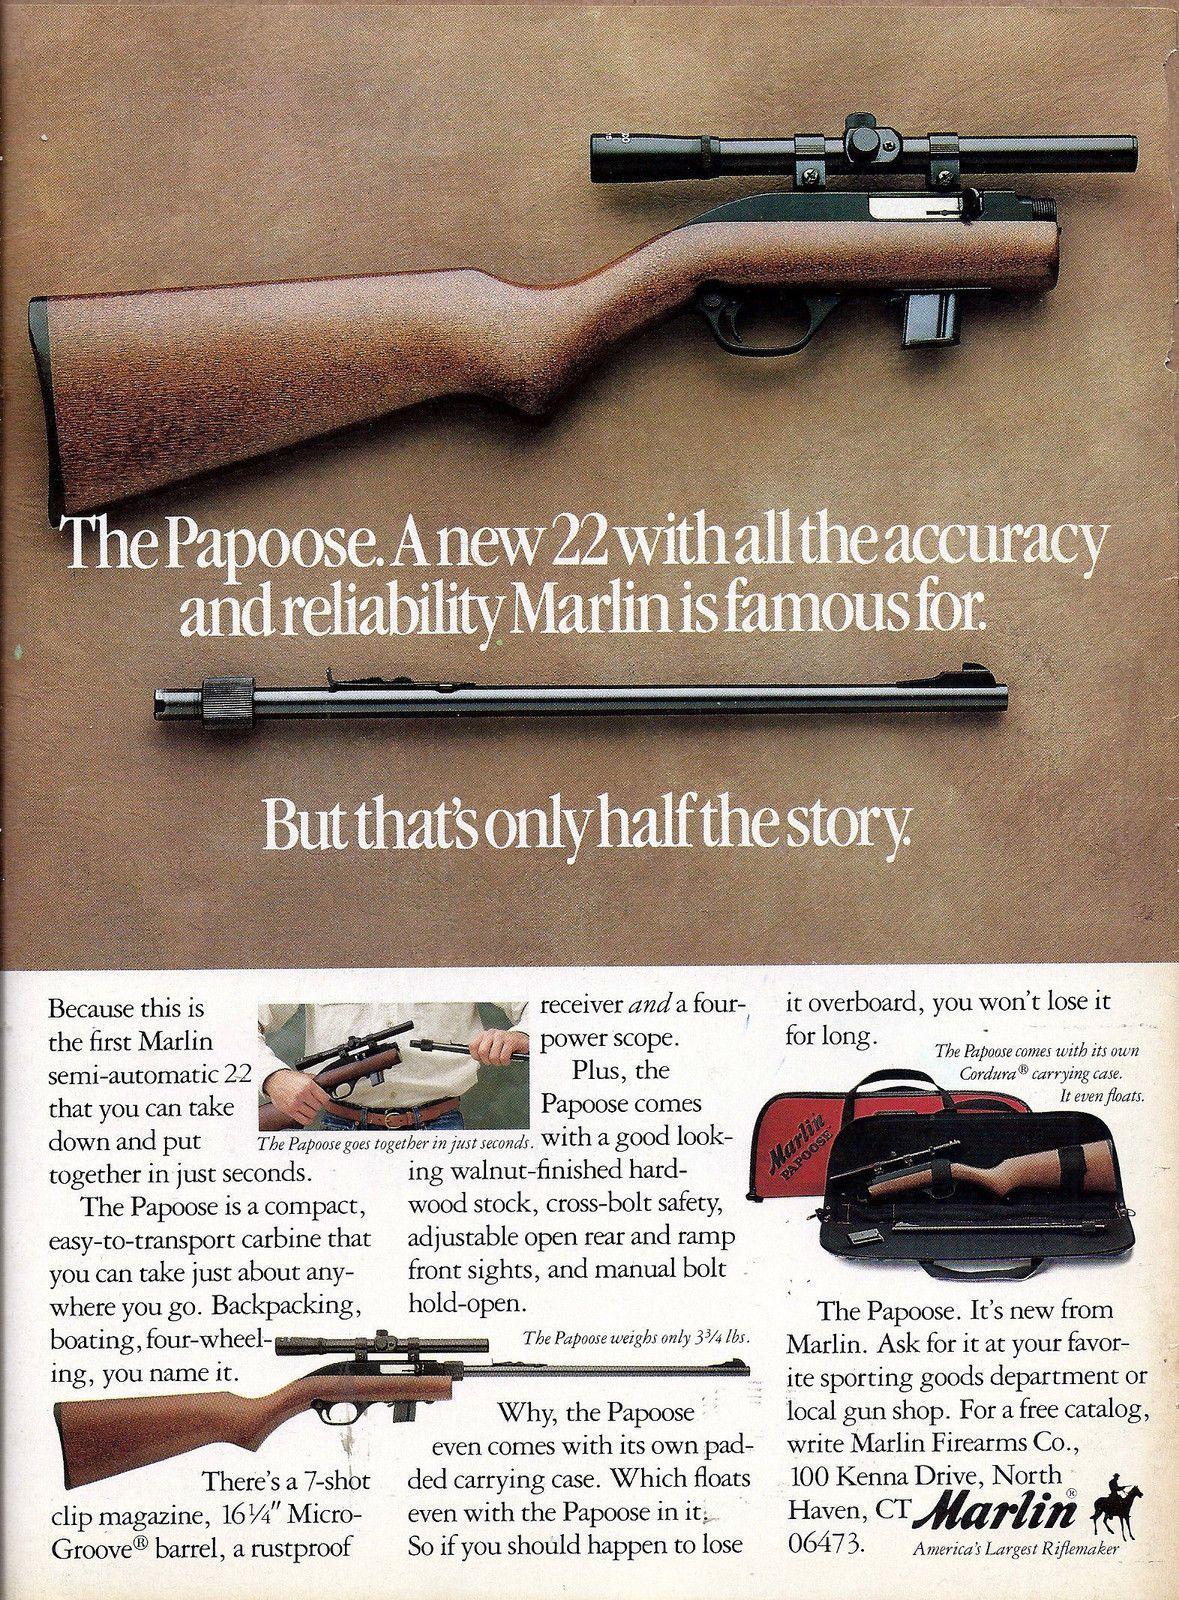 Pin by Richard Long on Vintage Gun Ads | Hunting guns